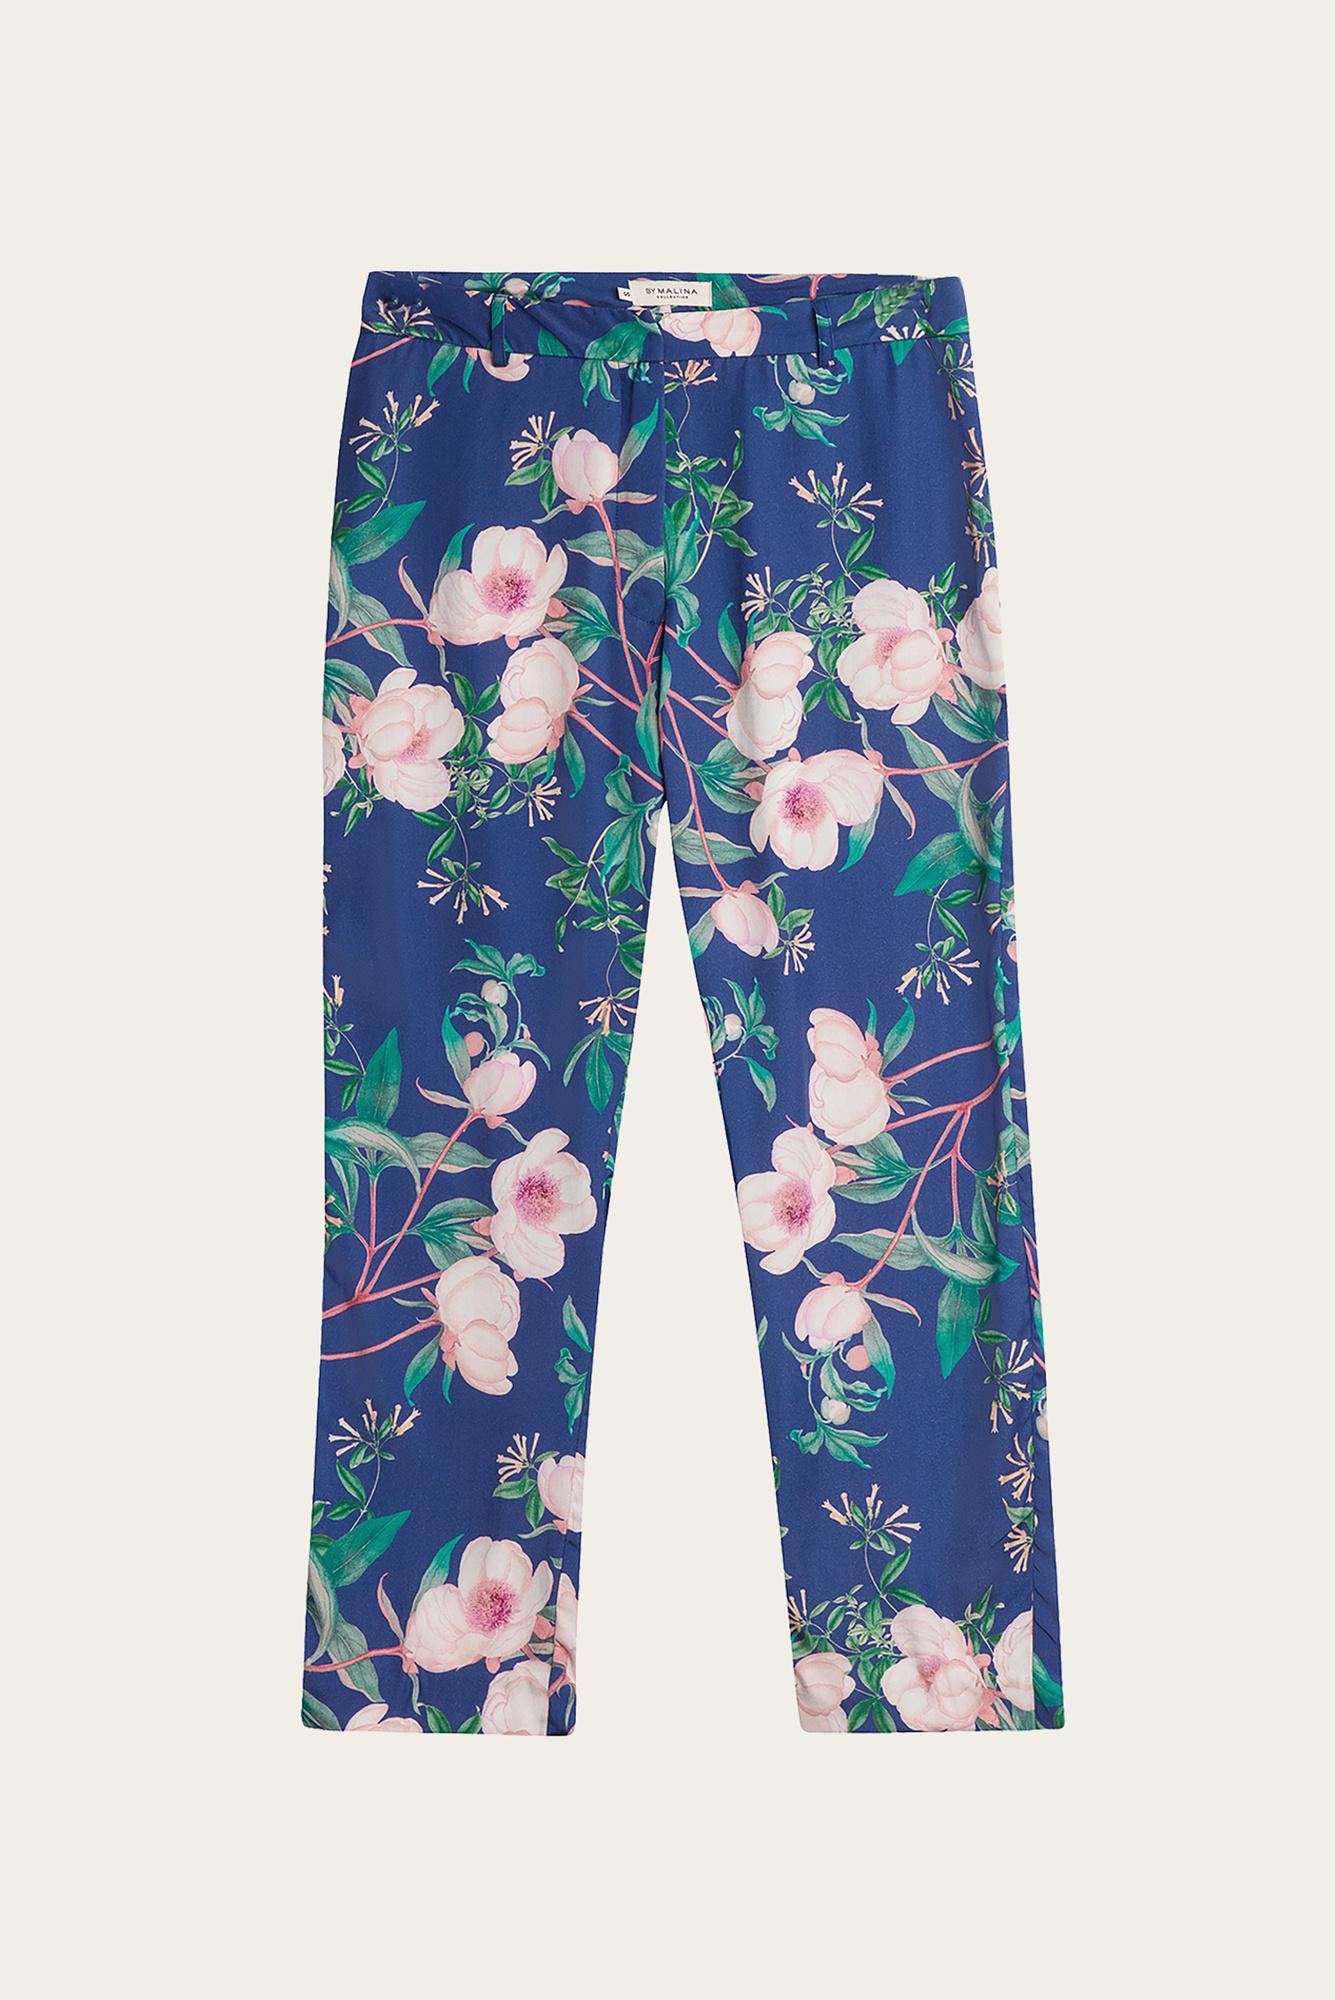 864_113d04816e-leah-pants-azure-rose-by-malina-1-big.jpg